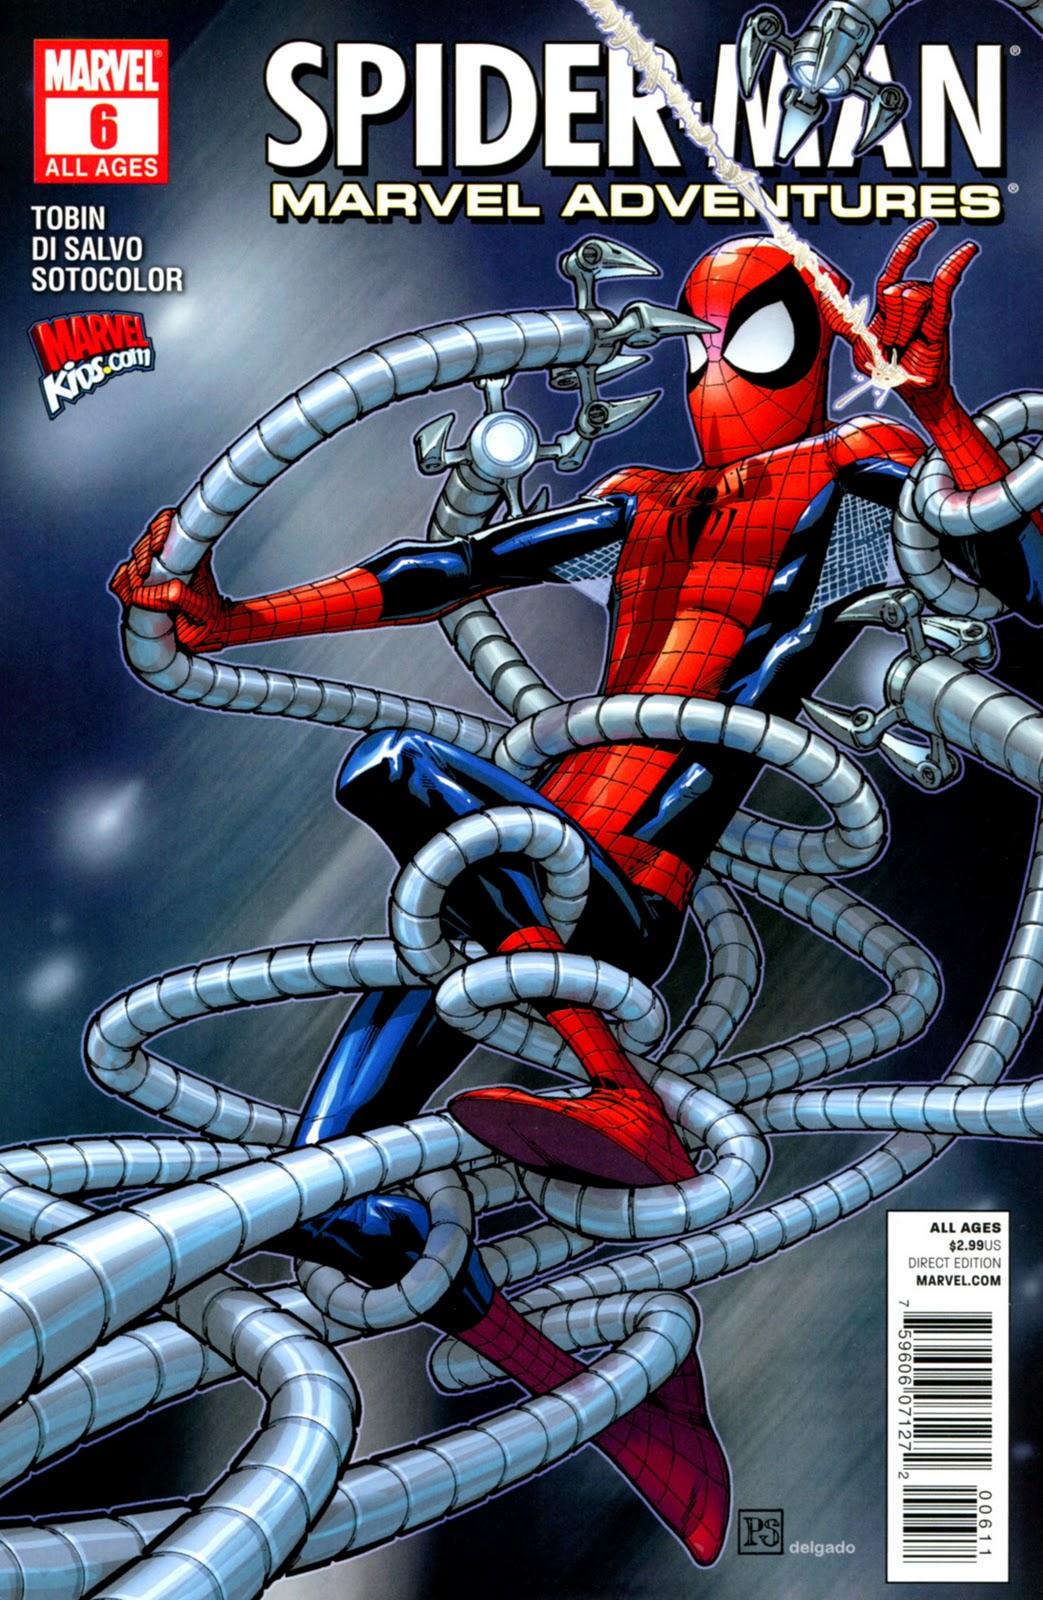 X Men Supreme Marvel Adventures Spider Man 6